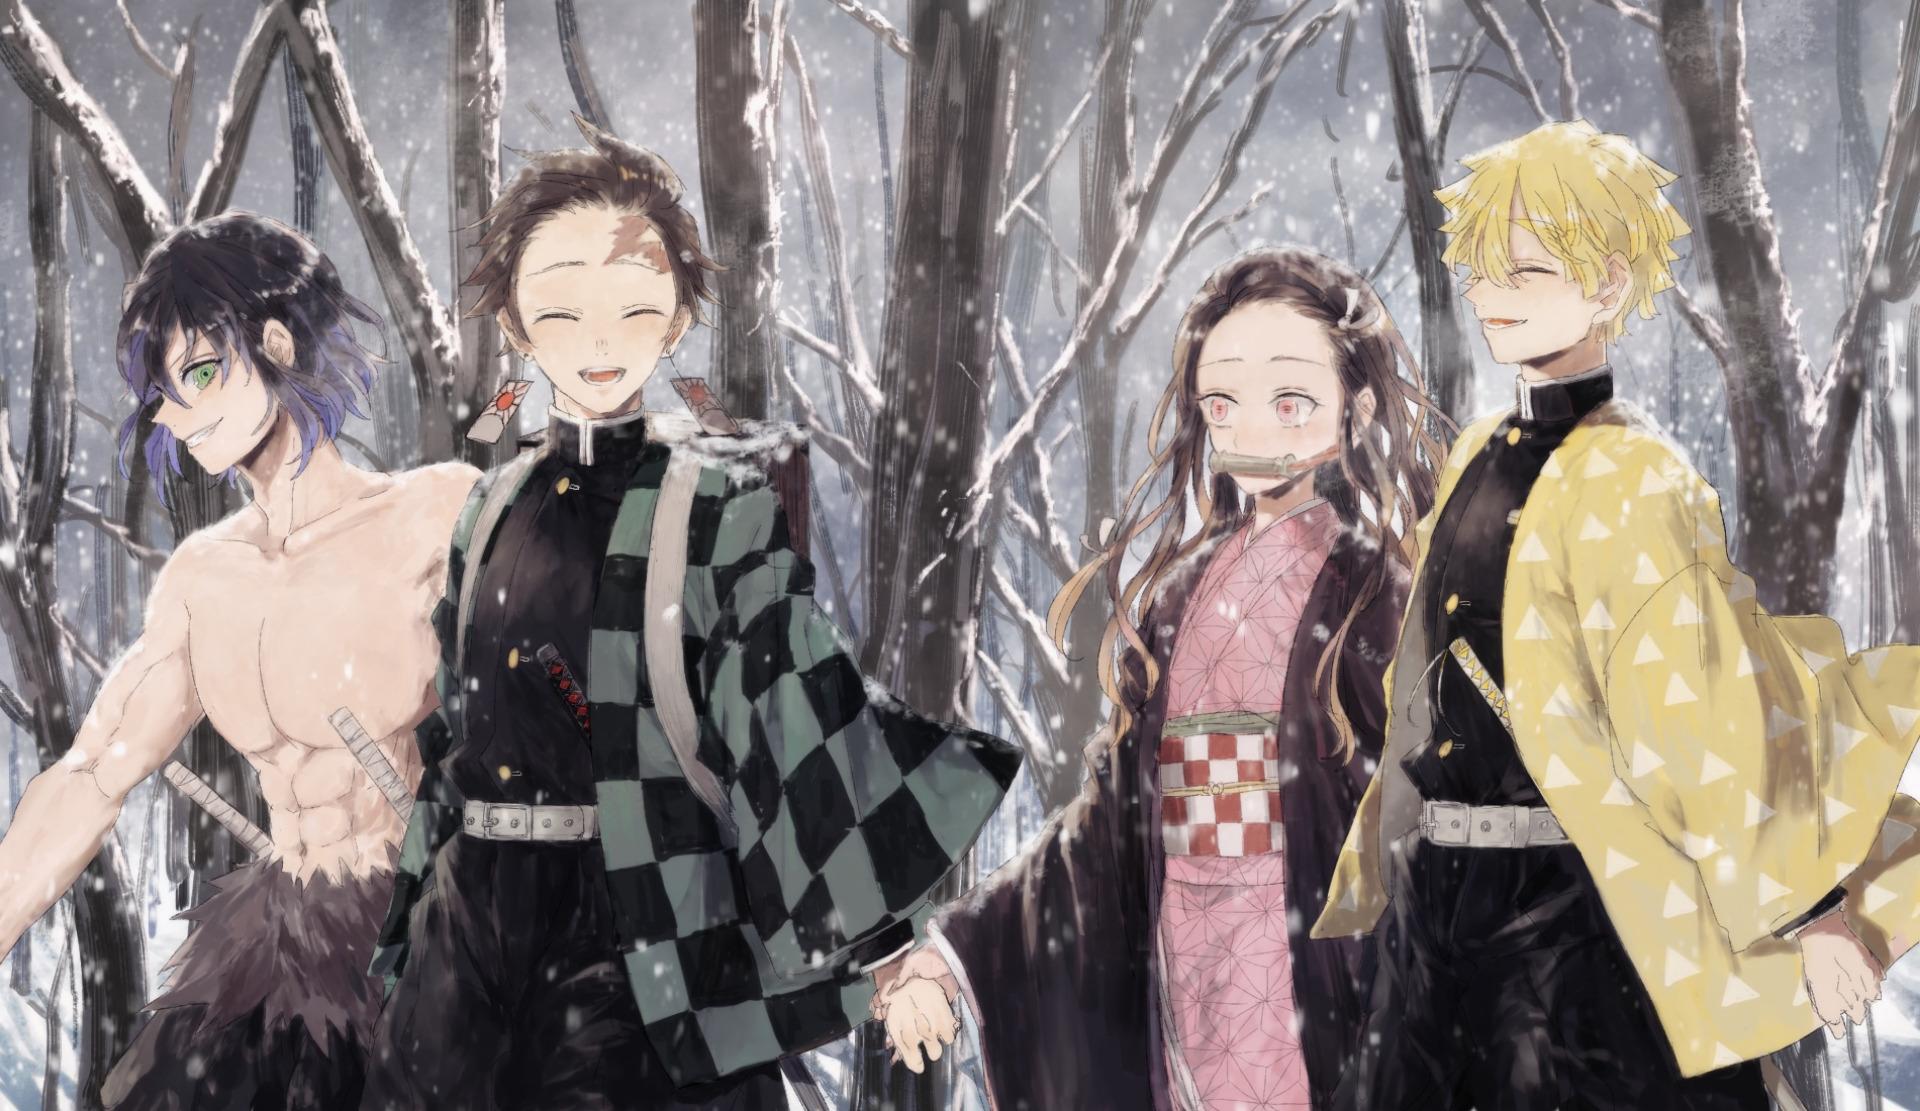 Demon Slayer: Kimetsu no Yaiba HD Wallpaper  Background Image  1920x1111  ID:1000160